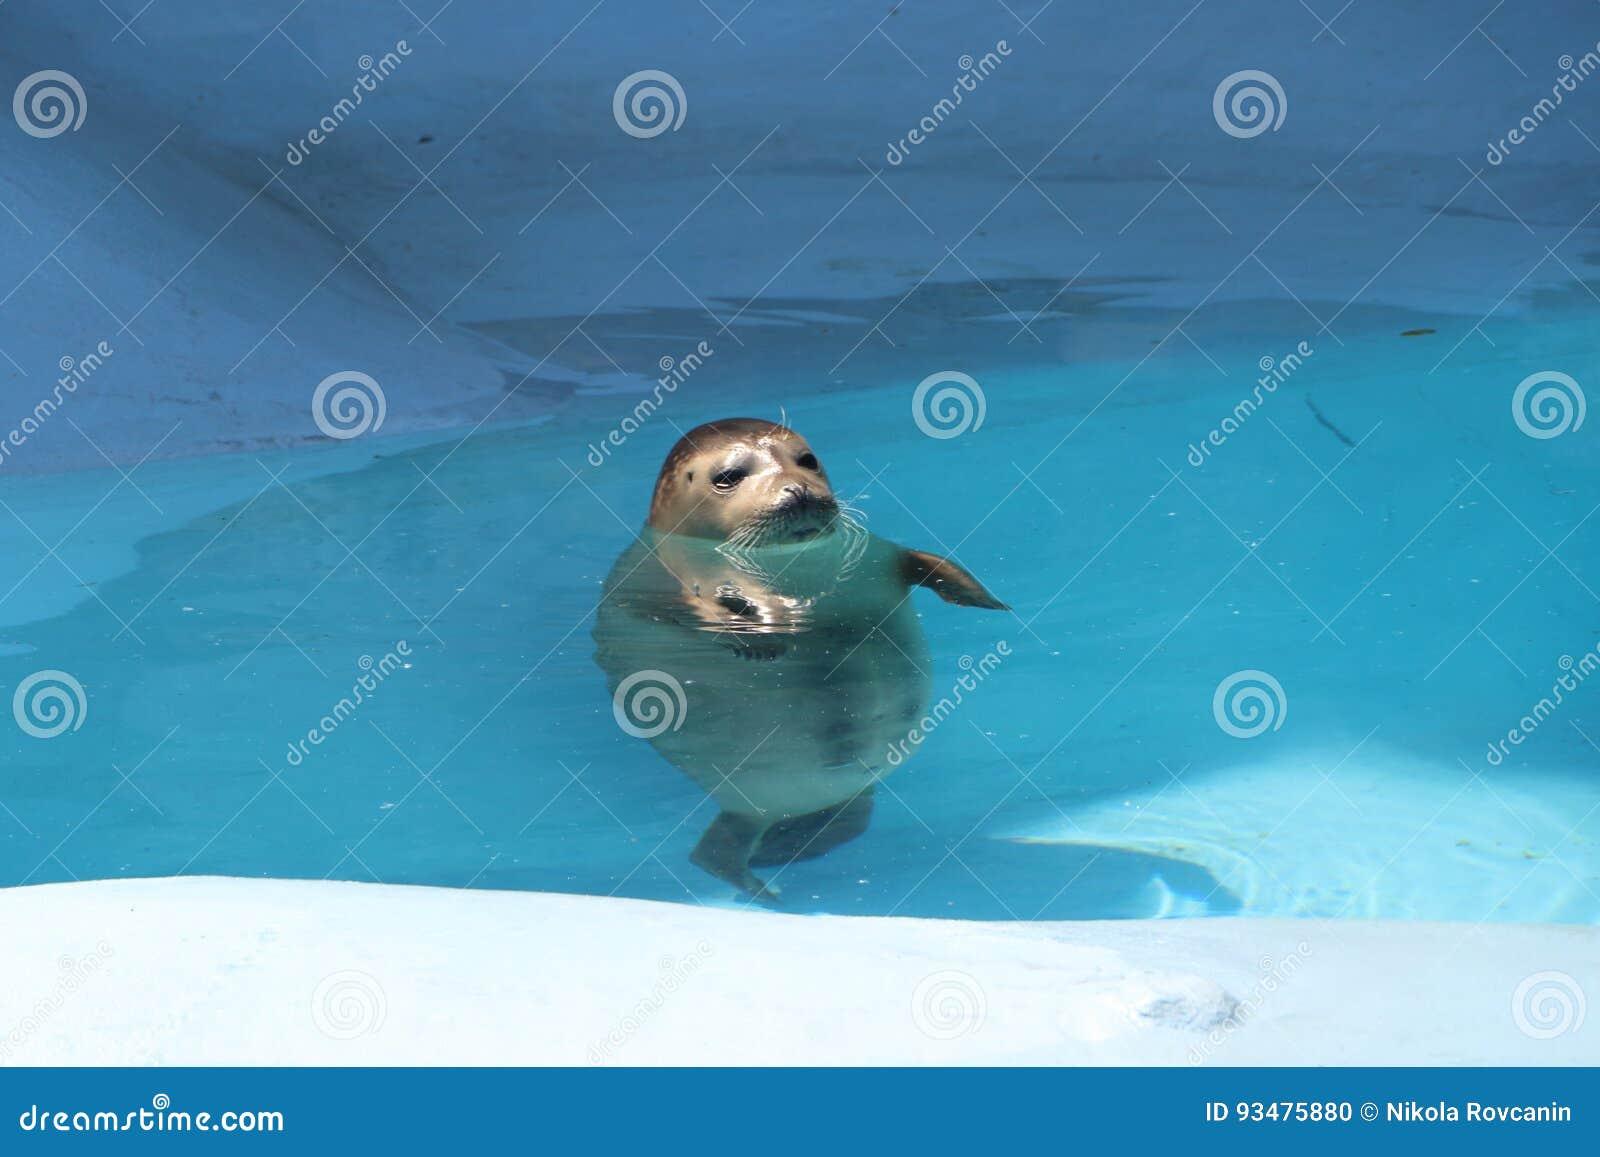 Seal in pool